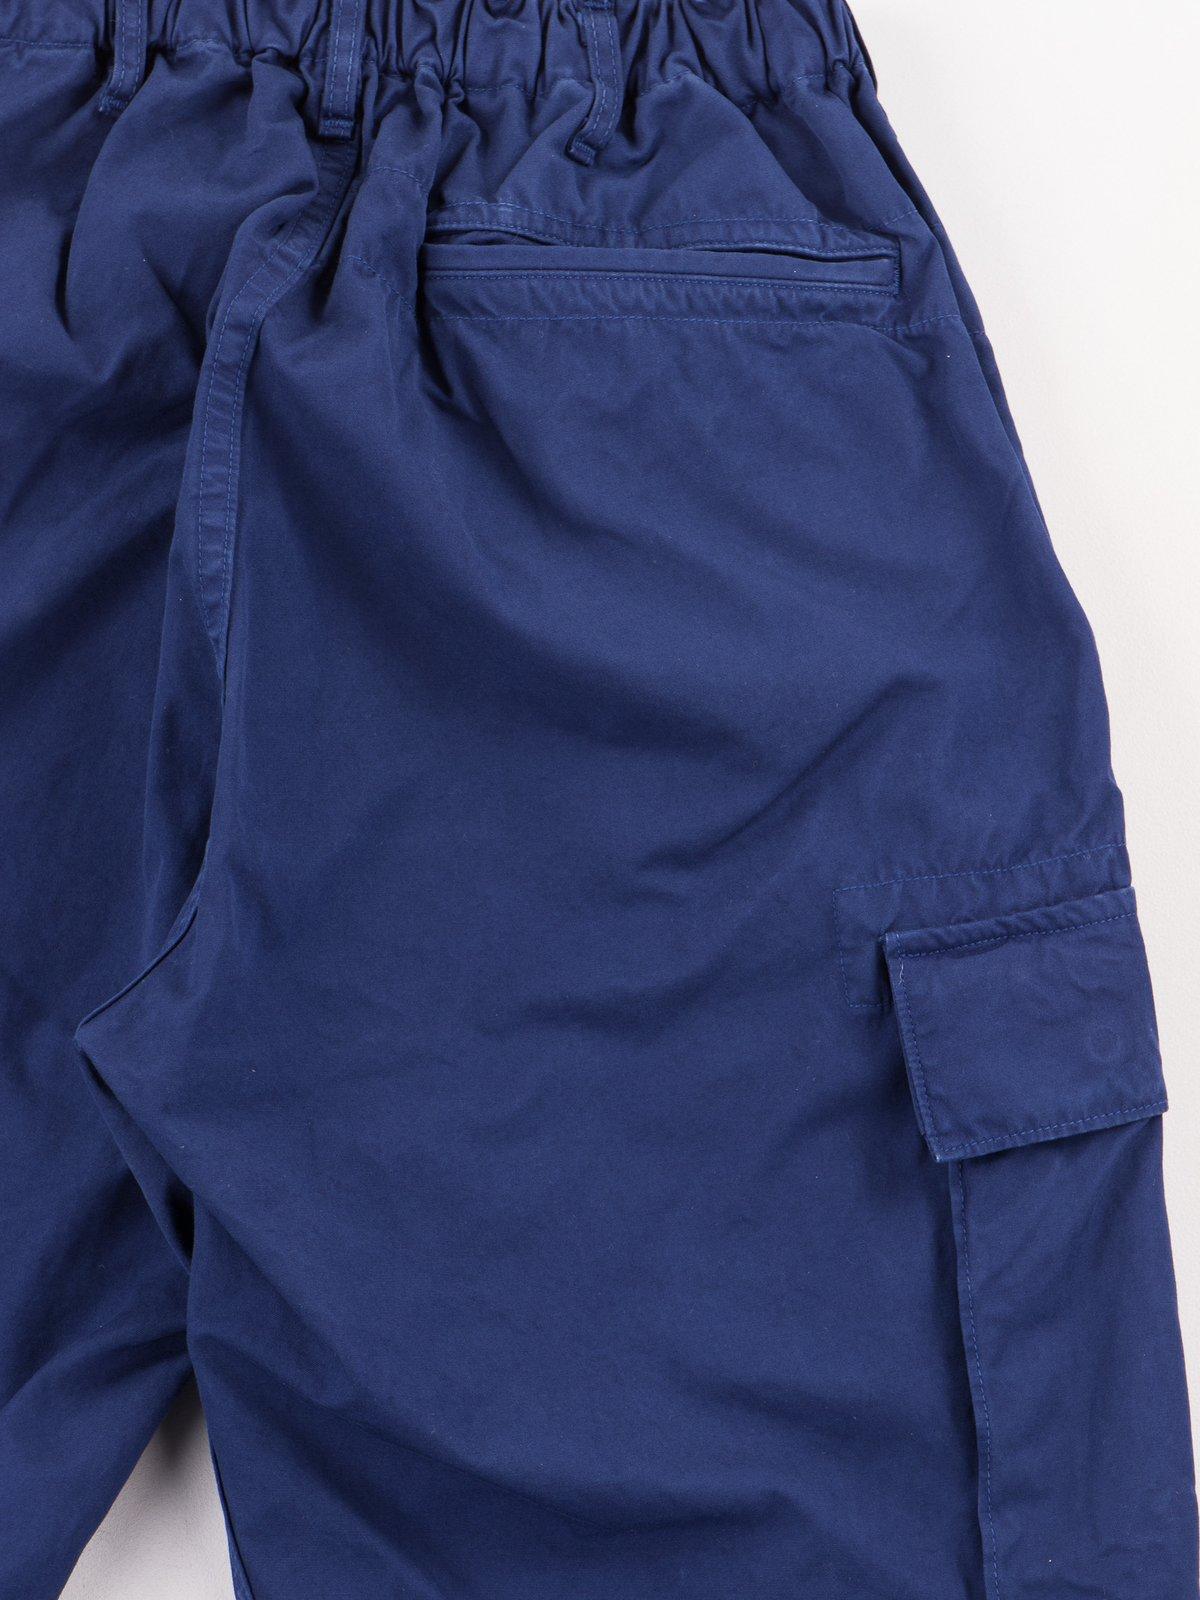 Ink Blue Poplin Easy Cargo Pant - Image 8